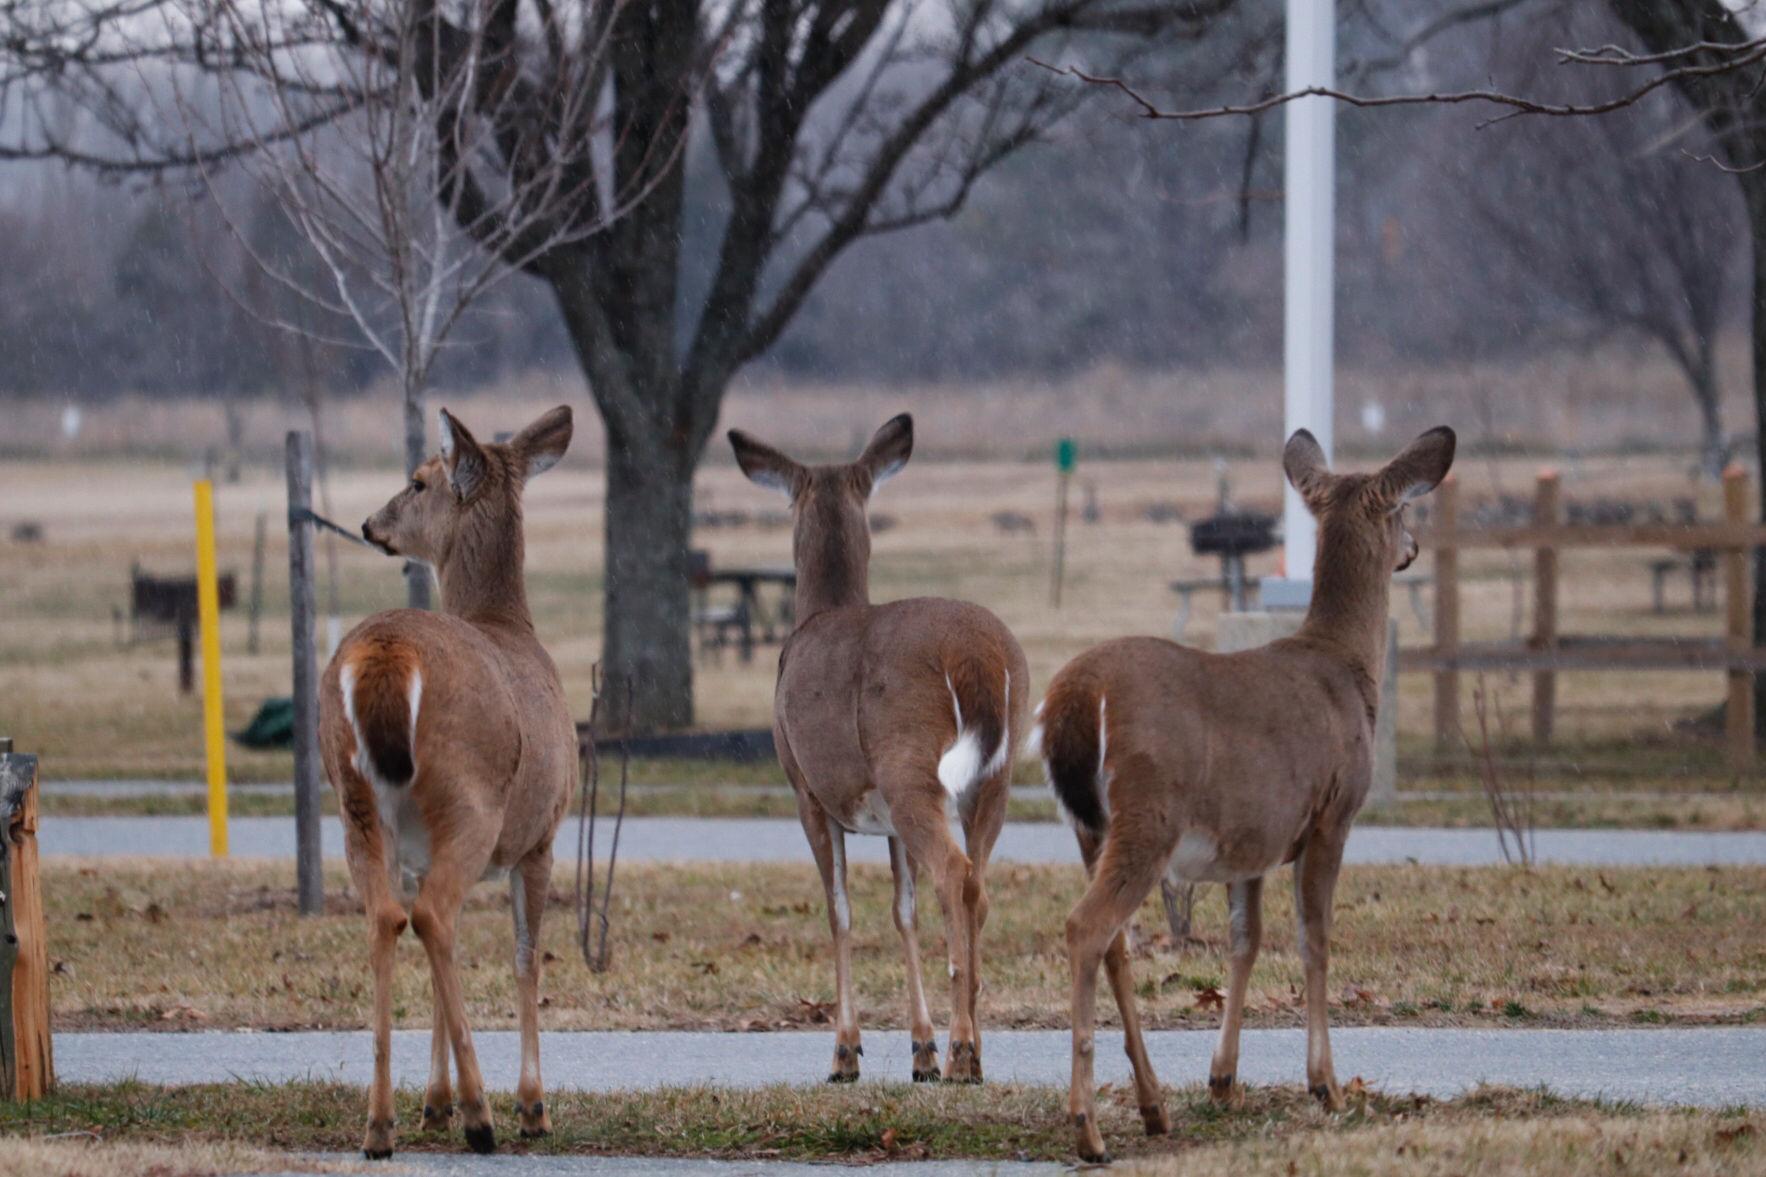 As deer enter mating season, drivers should be more aware of